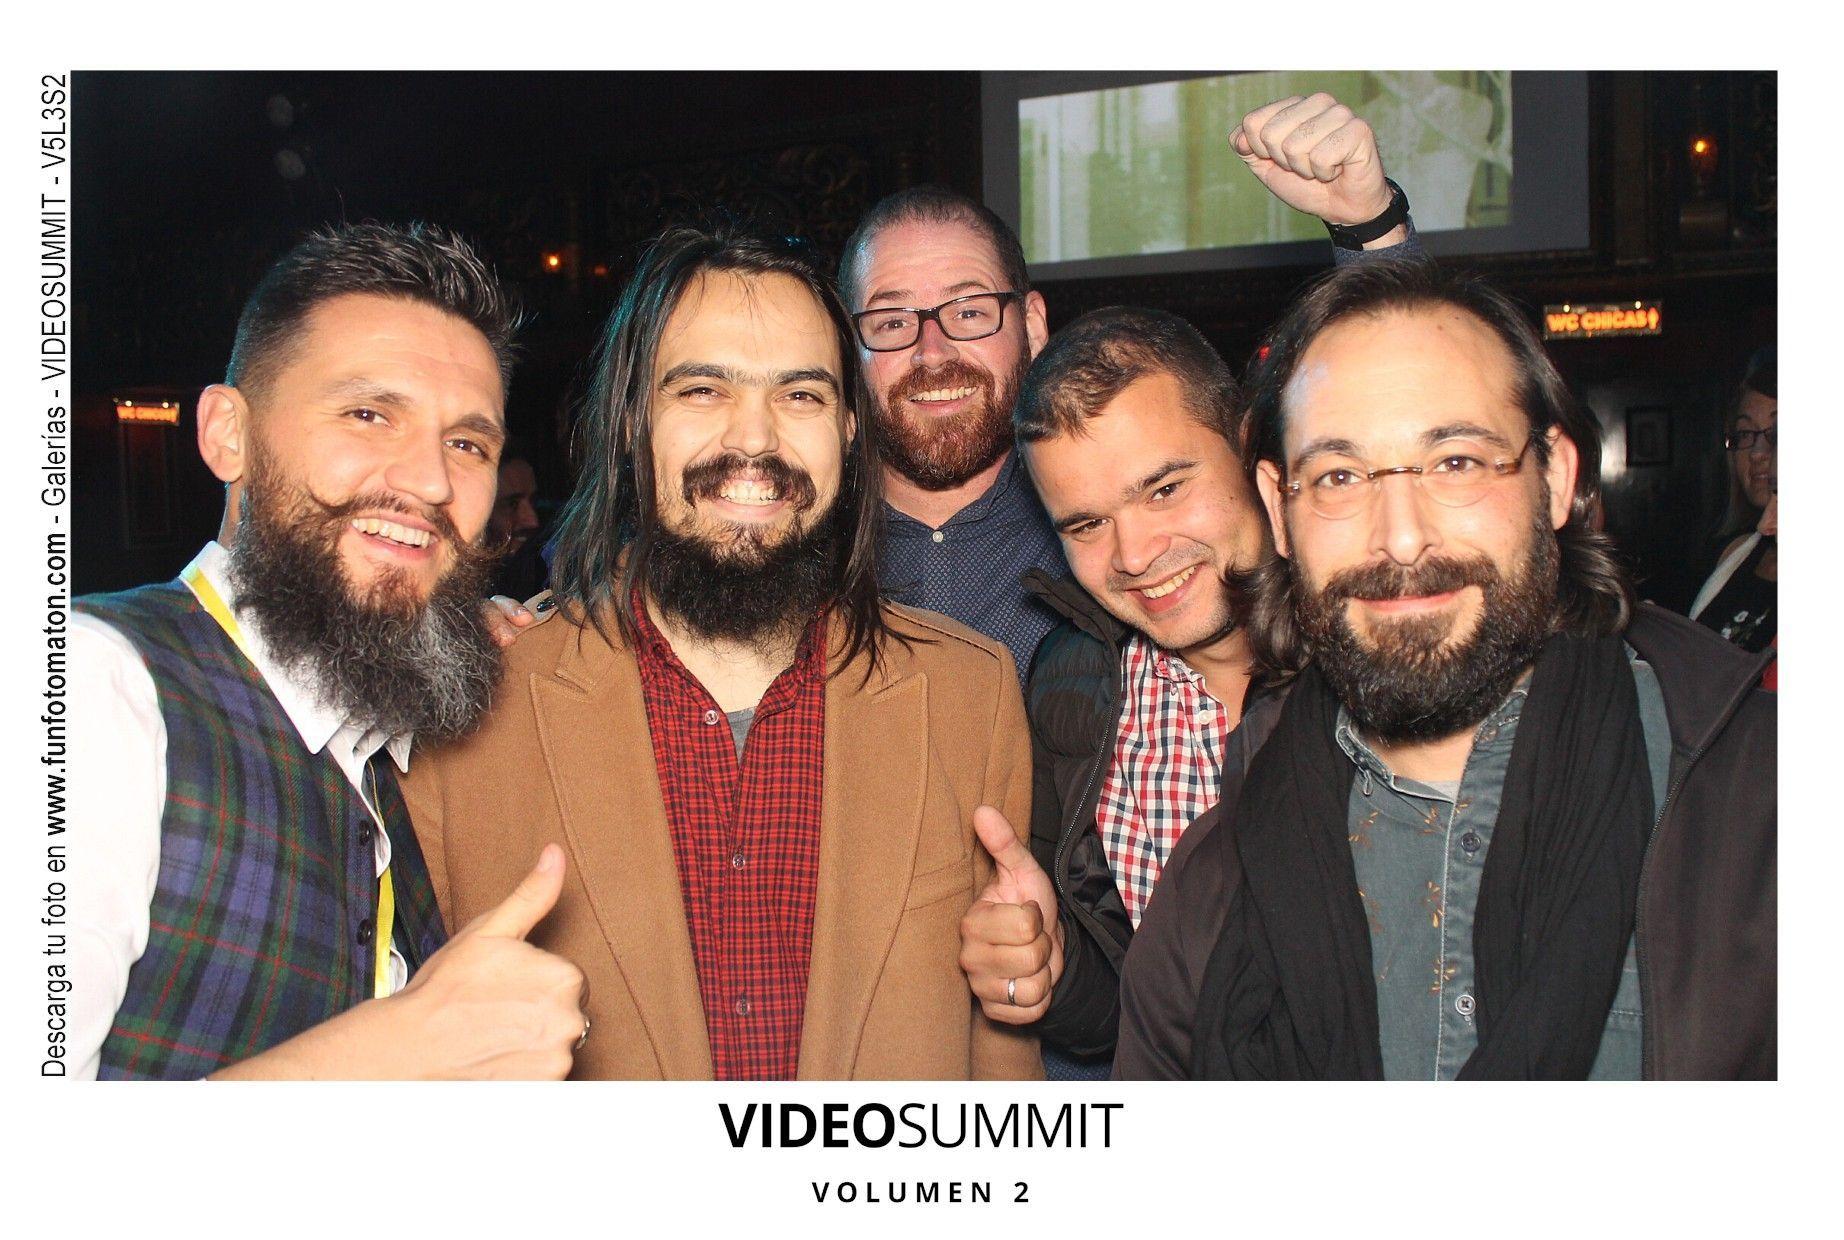 videosummit-vol2-club-party-004